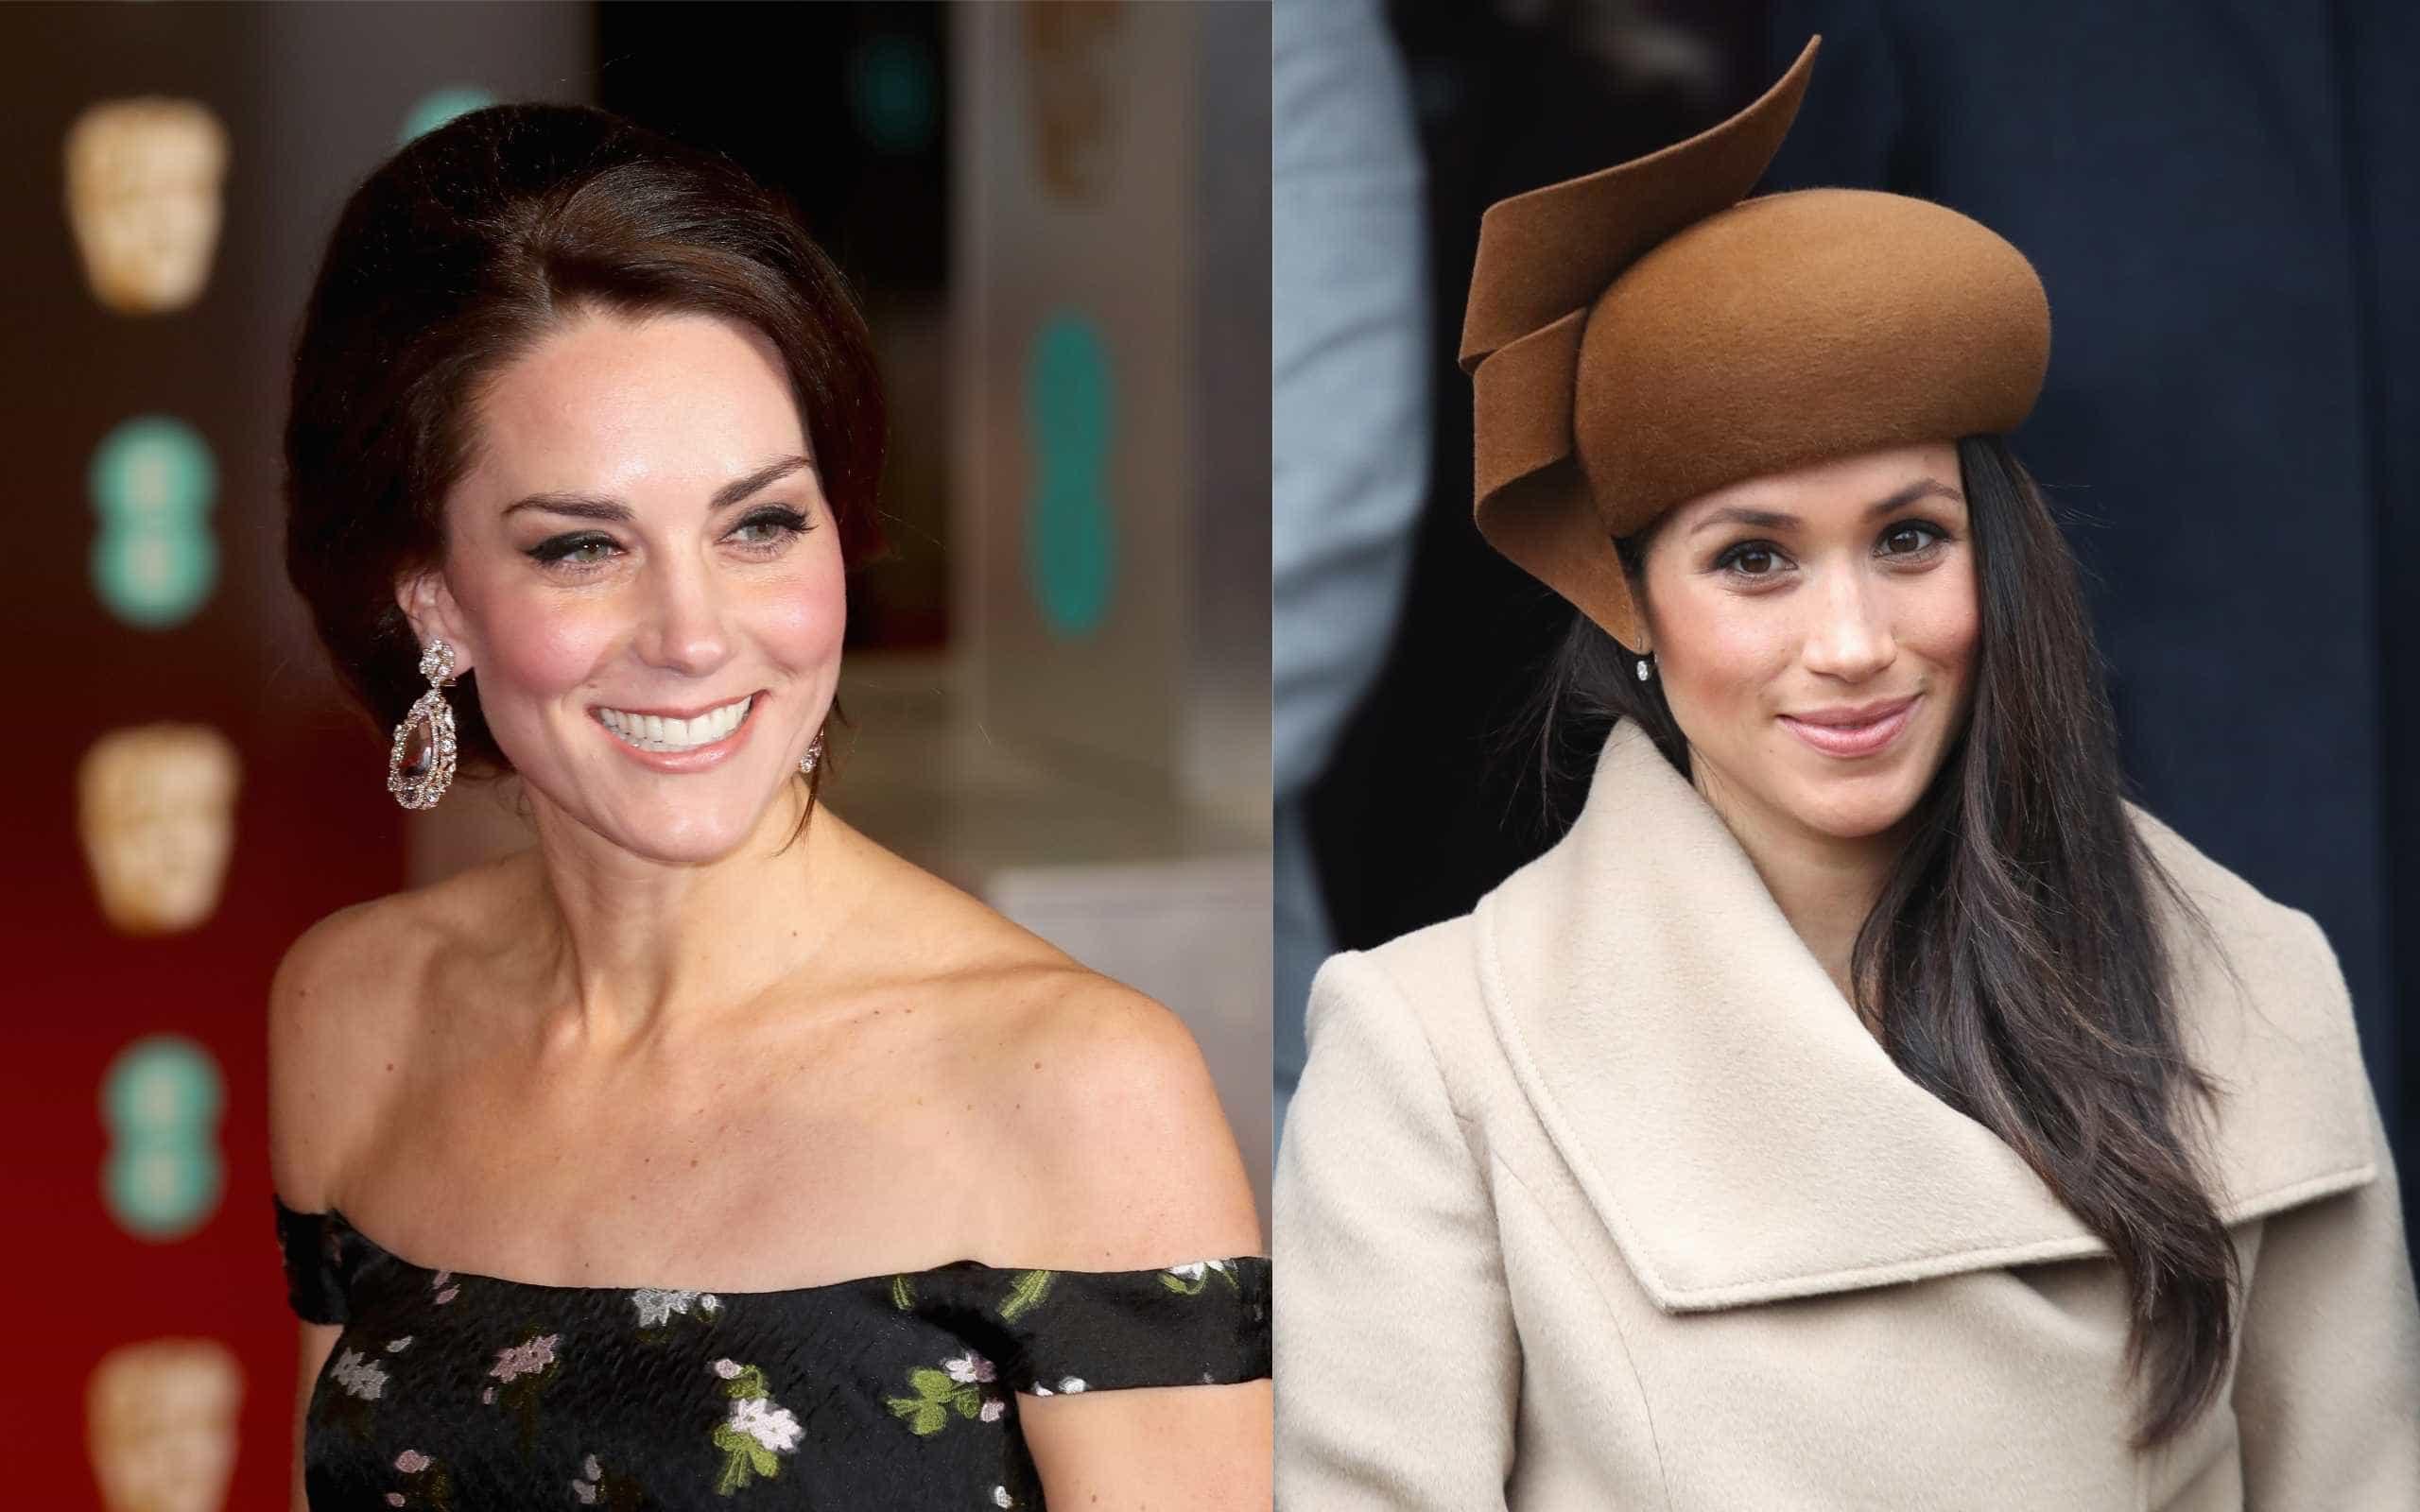 Pequeno detalhe aumenta rumor de mal-estar entre Kate e Meghan Markle